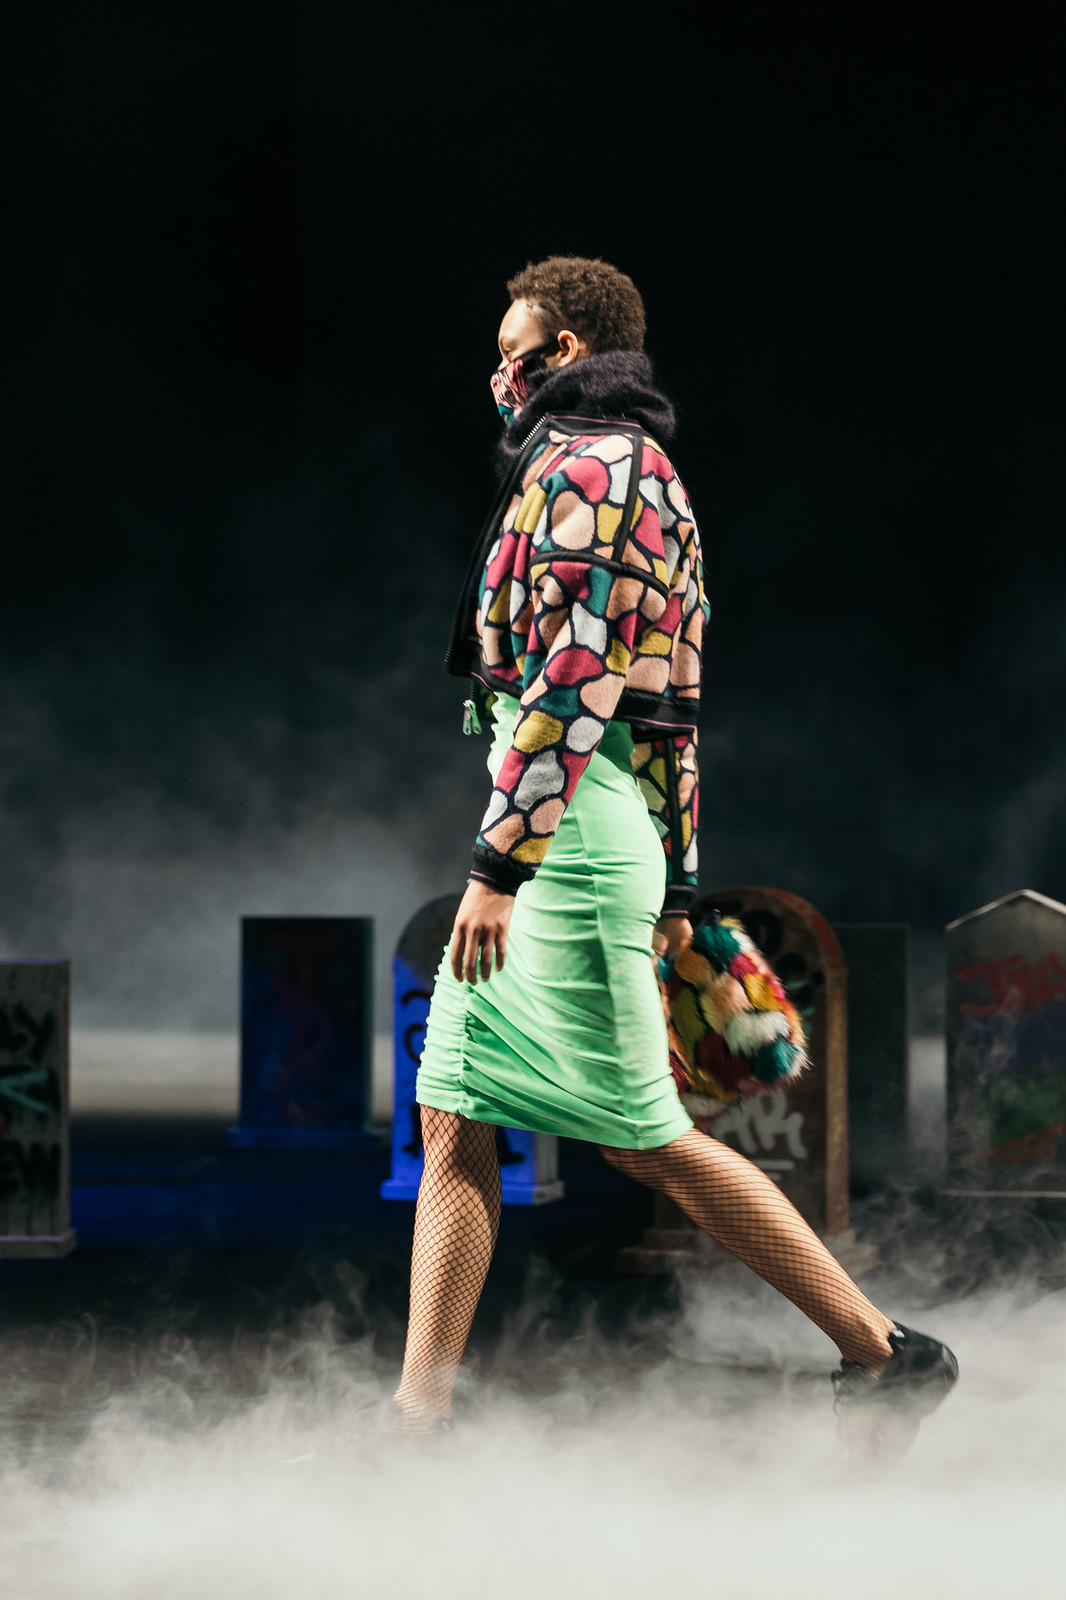 Jessie Chanes - Seams for a desire - 080 Bacelona Fashion #080bcnfasion -53